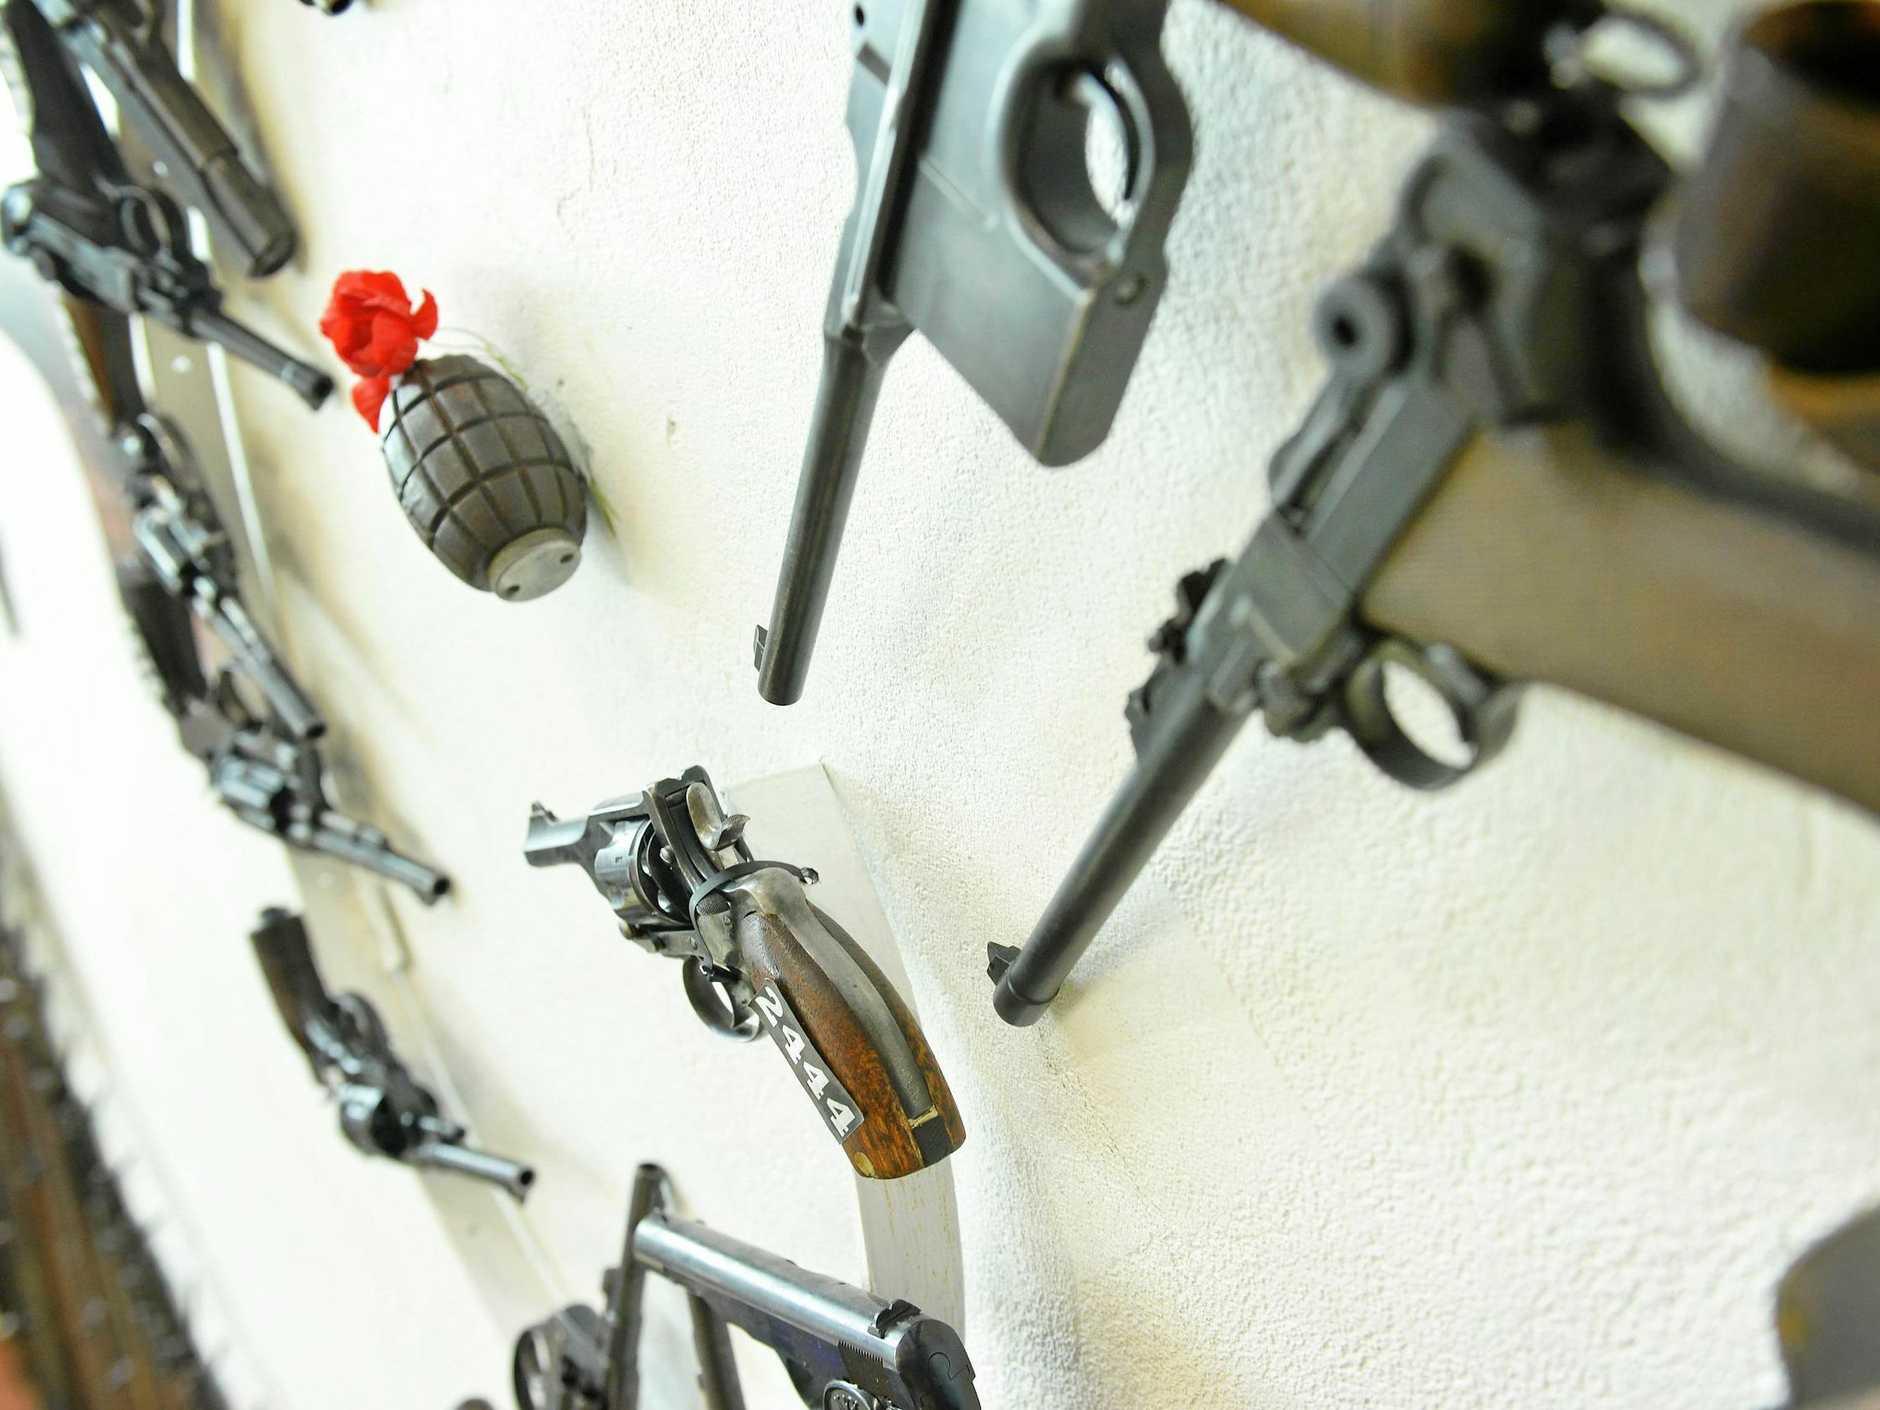 Ron Owen openening Owen's guns museum in Gympie.